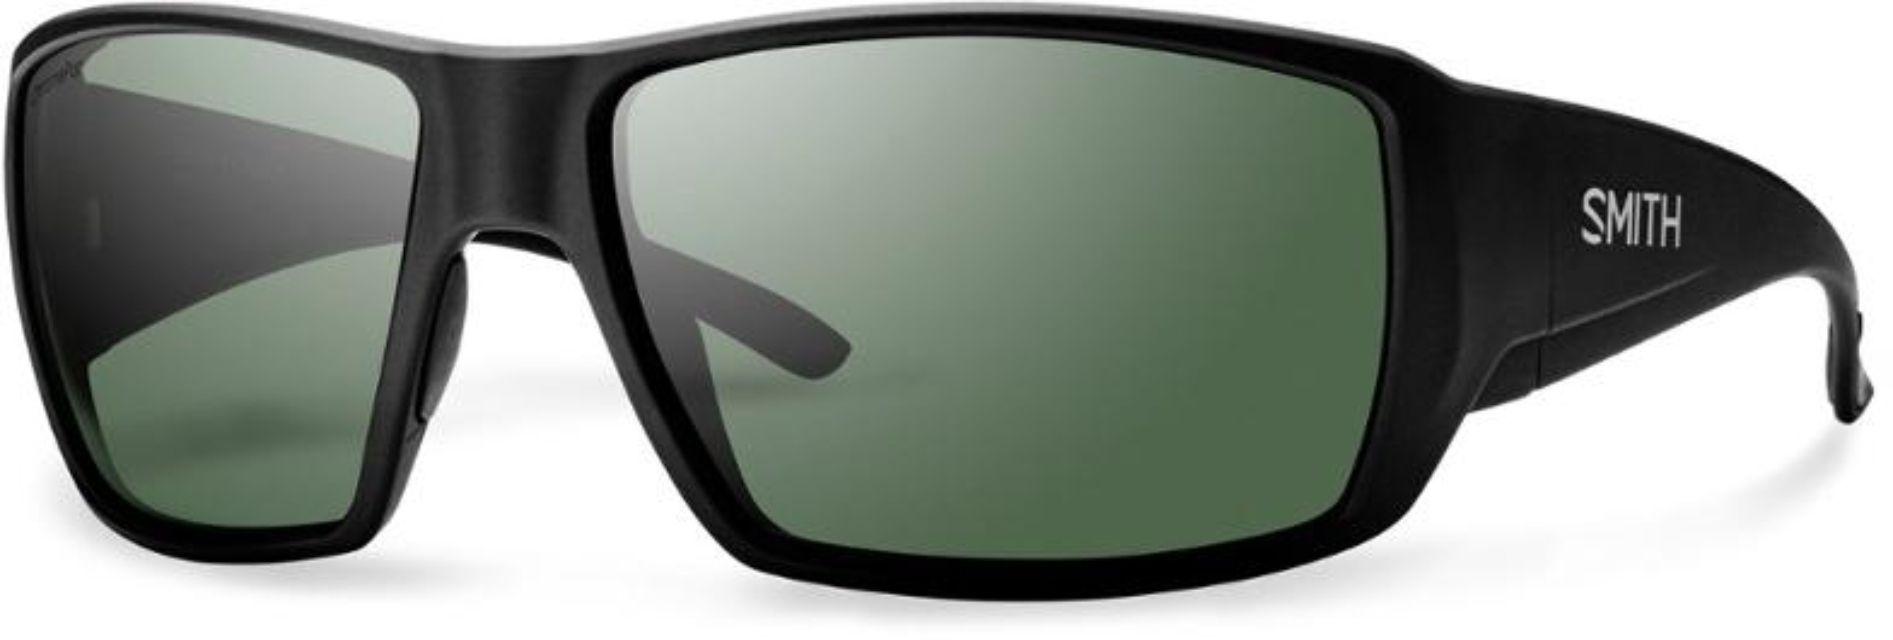 db04c9c657 Best for Women  Guide s Choice ChromaPop Polarized sunglasses